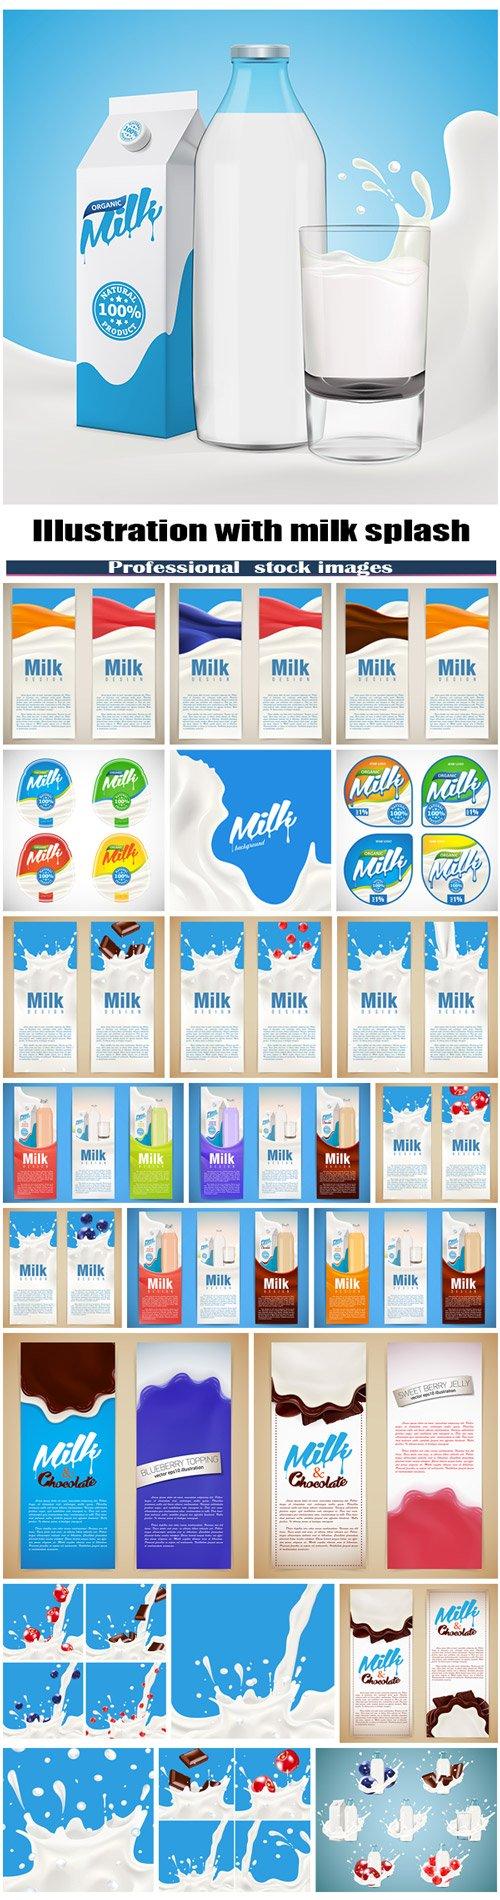 Milk design vector illustration with milk splash